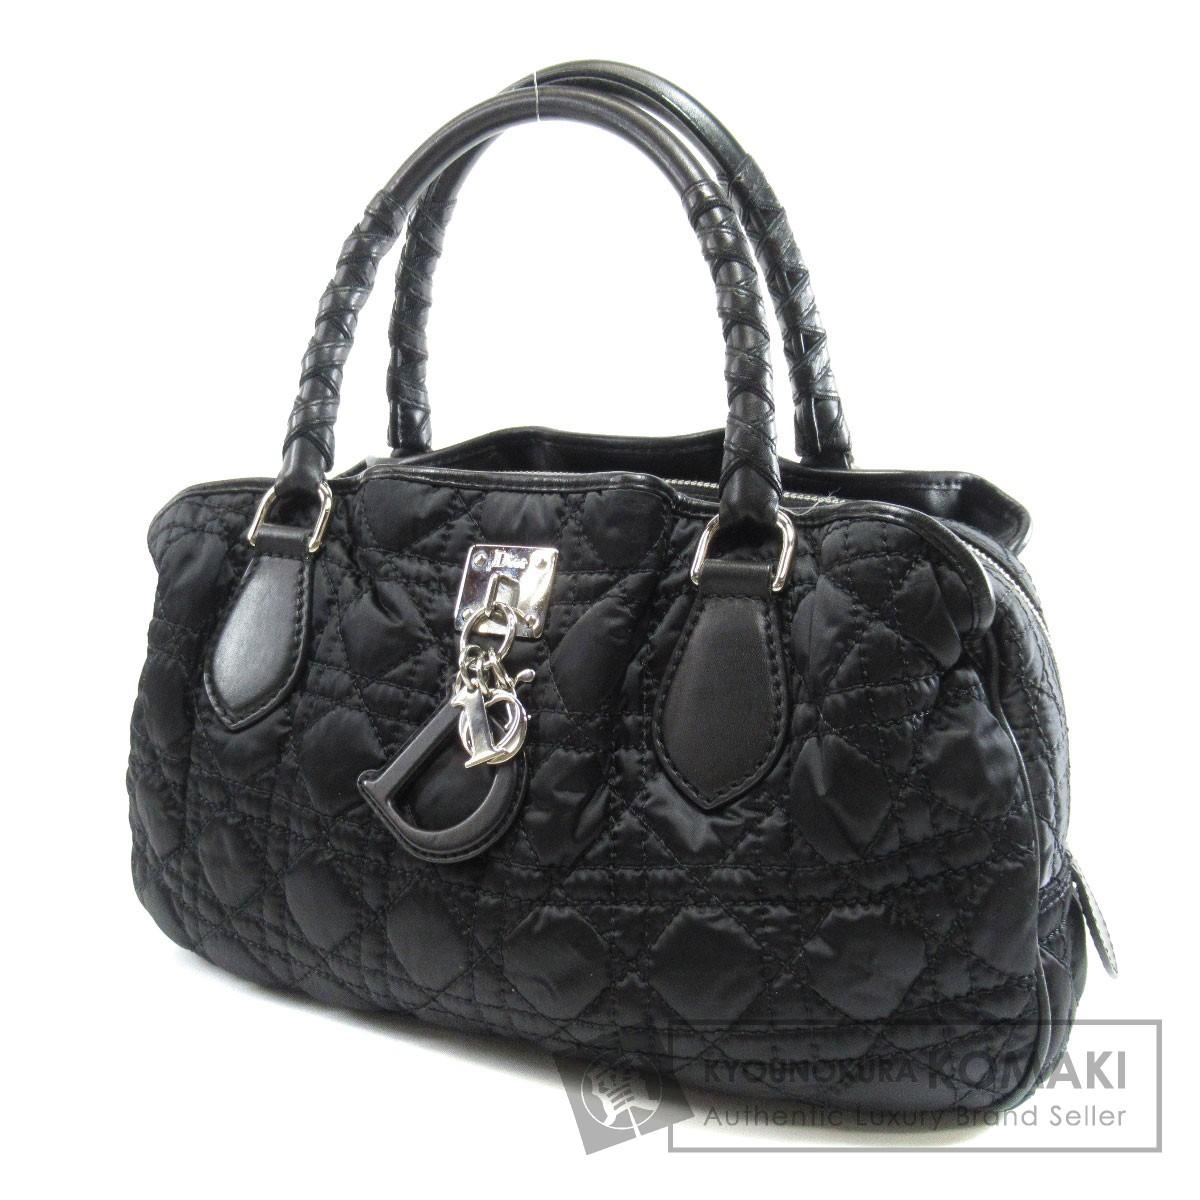 Dior キルティング ロゴプレート ハンドバッグ ナイロン素材/レザー レディース 【中古】【ディオール】